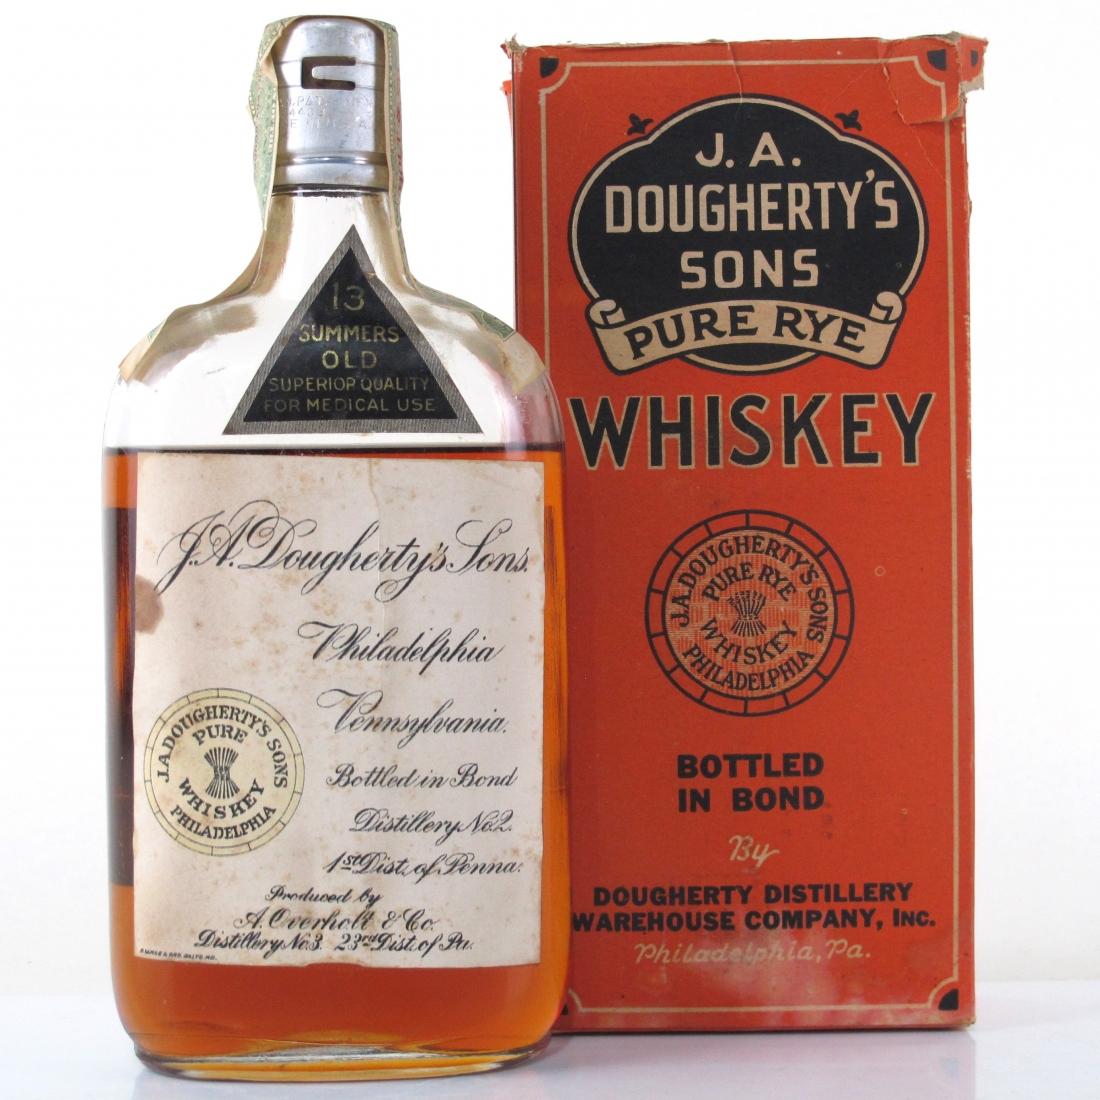 J A Dougherty's 1916 Pennsylvania Rye Whiskey / Bottled 1930